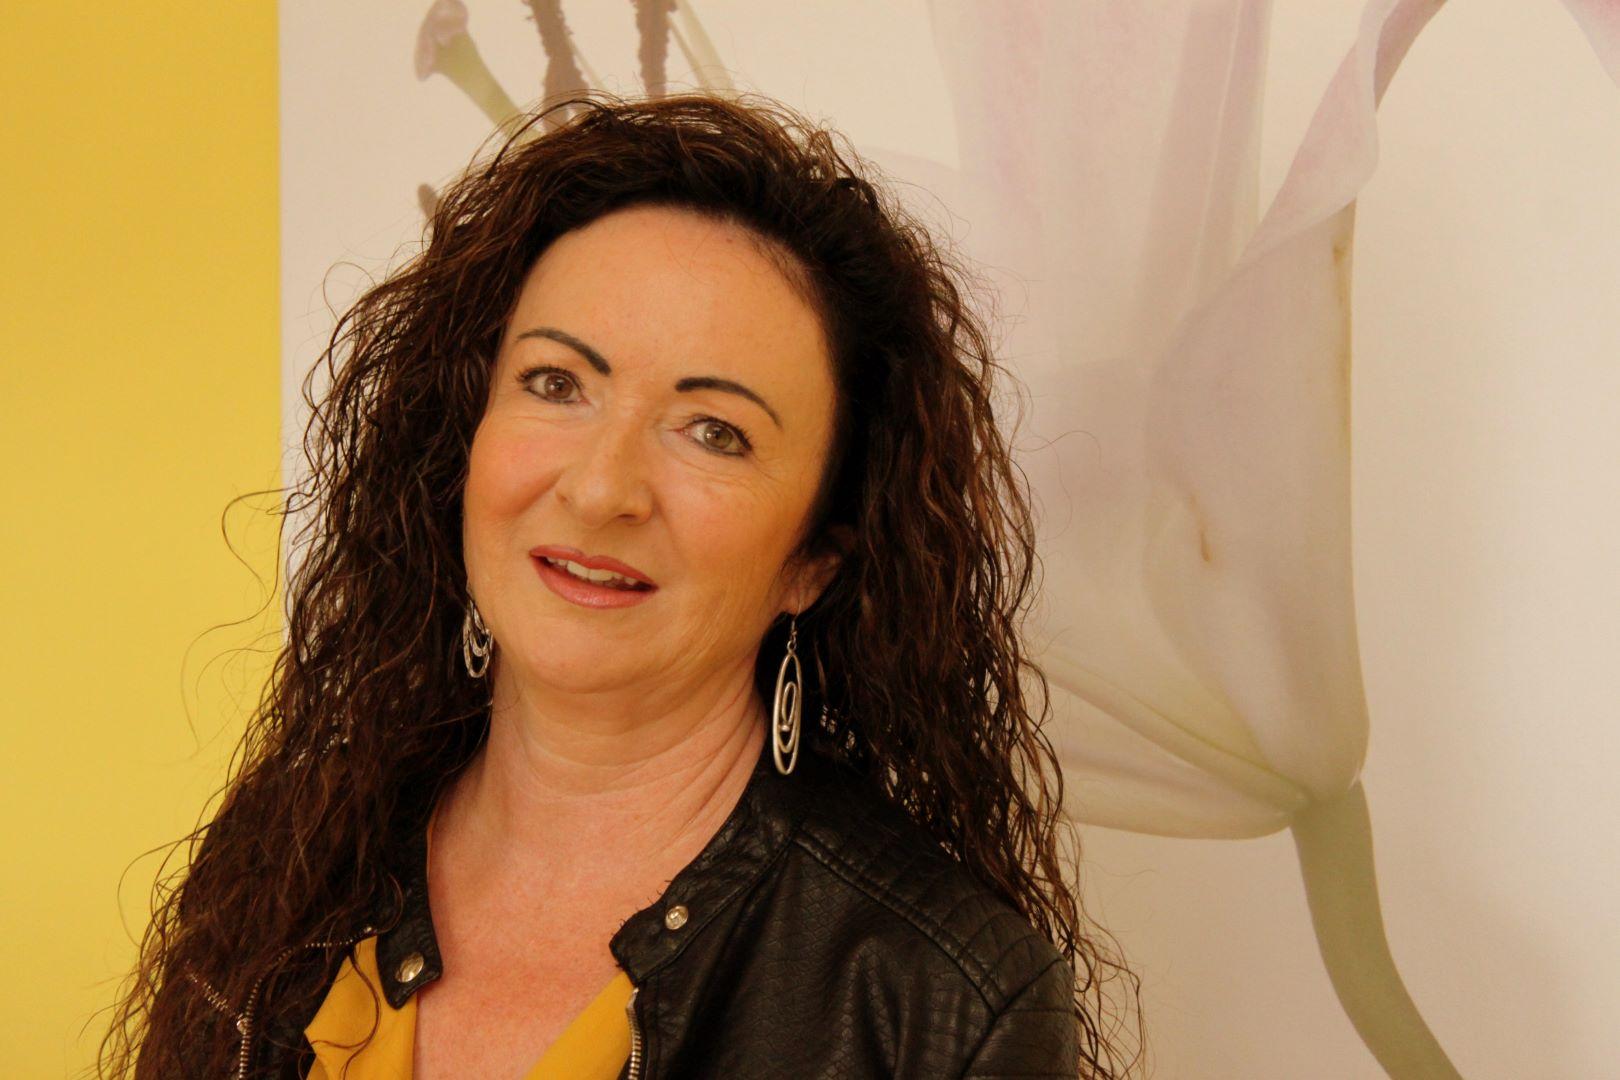 #Kosmetikstudio Im Zentrum_Katrin Widmer_2011.11.01